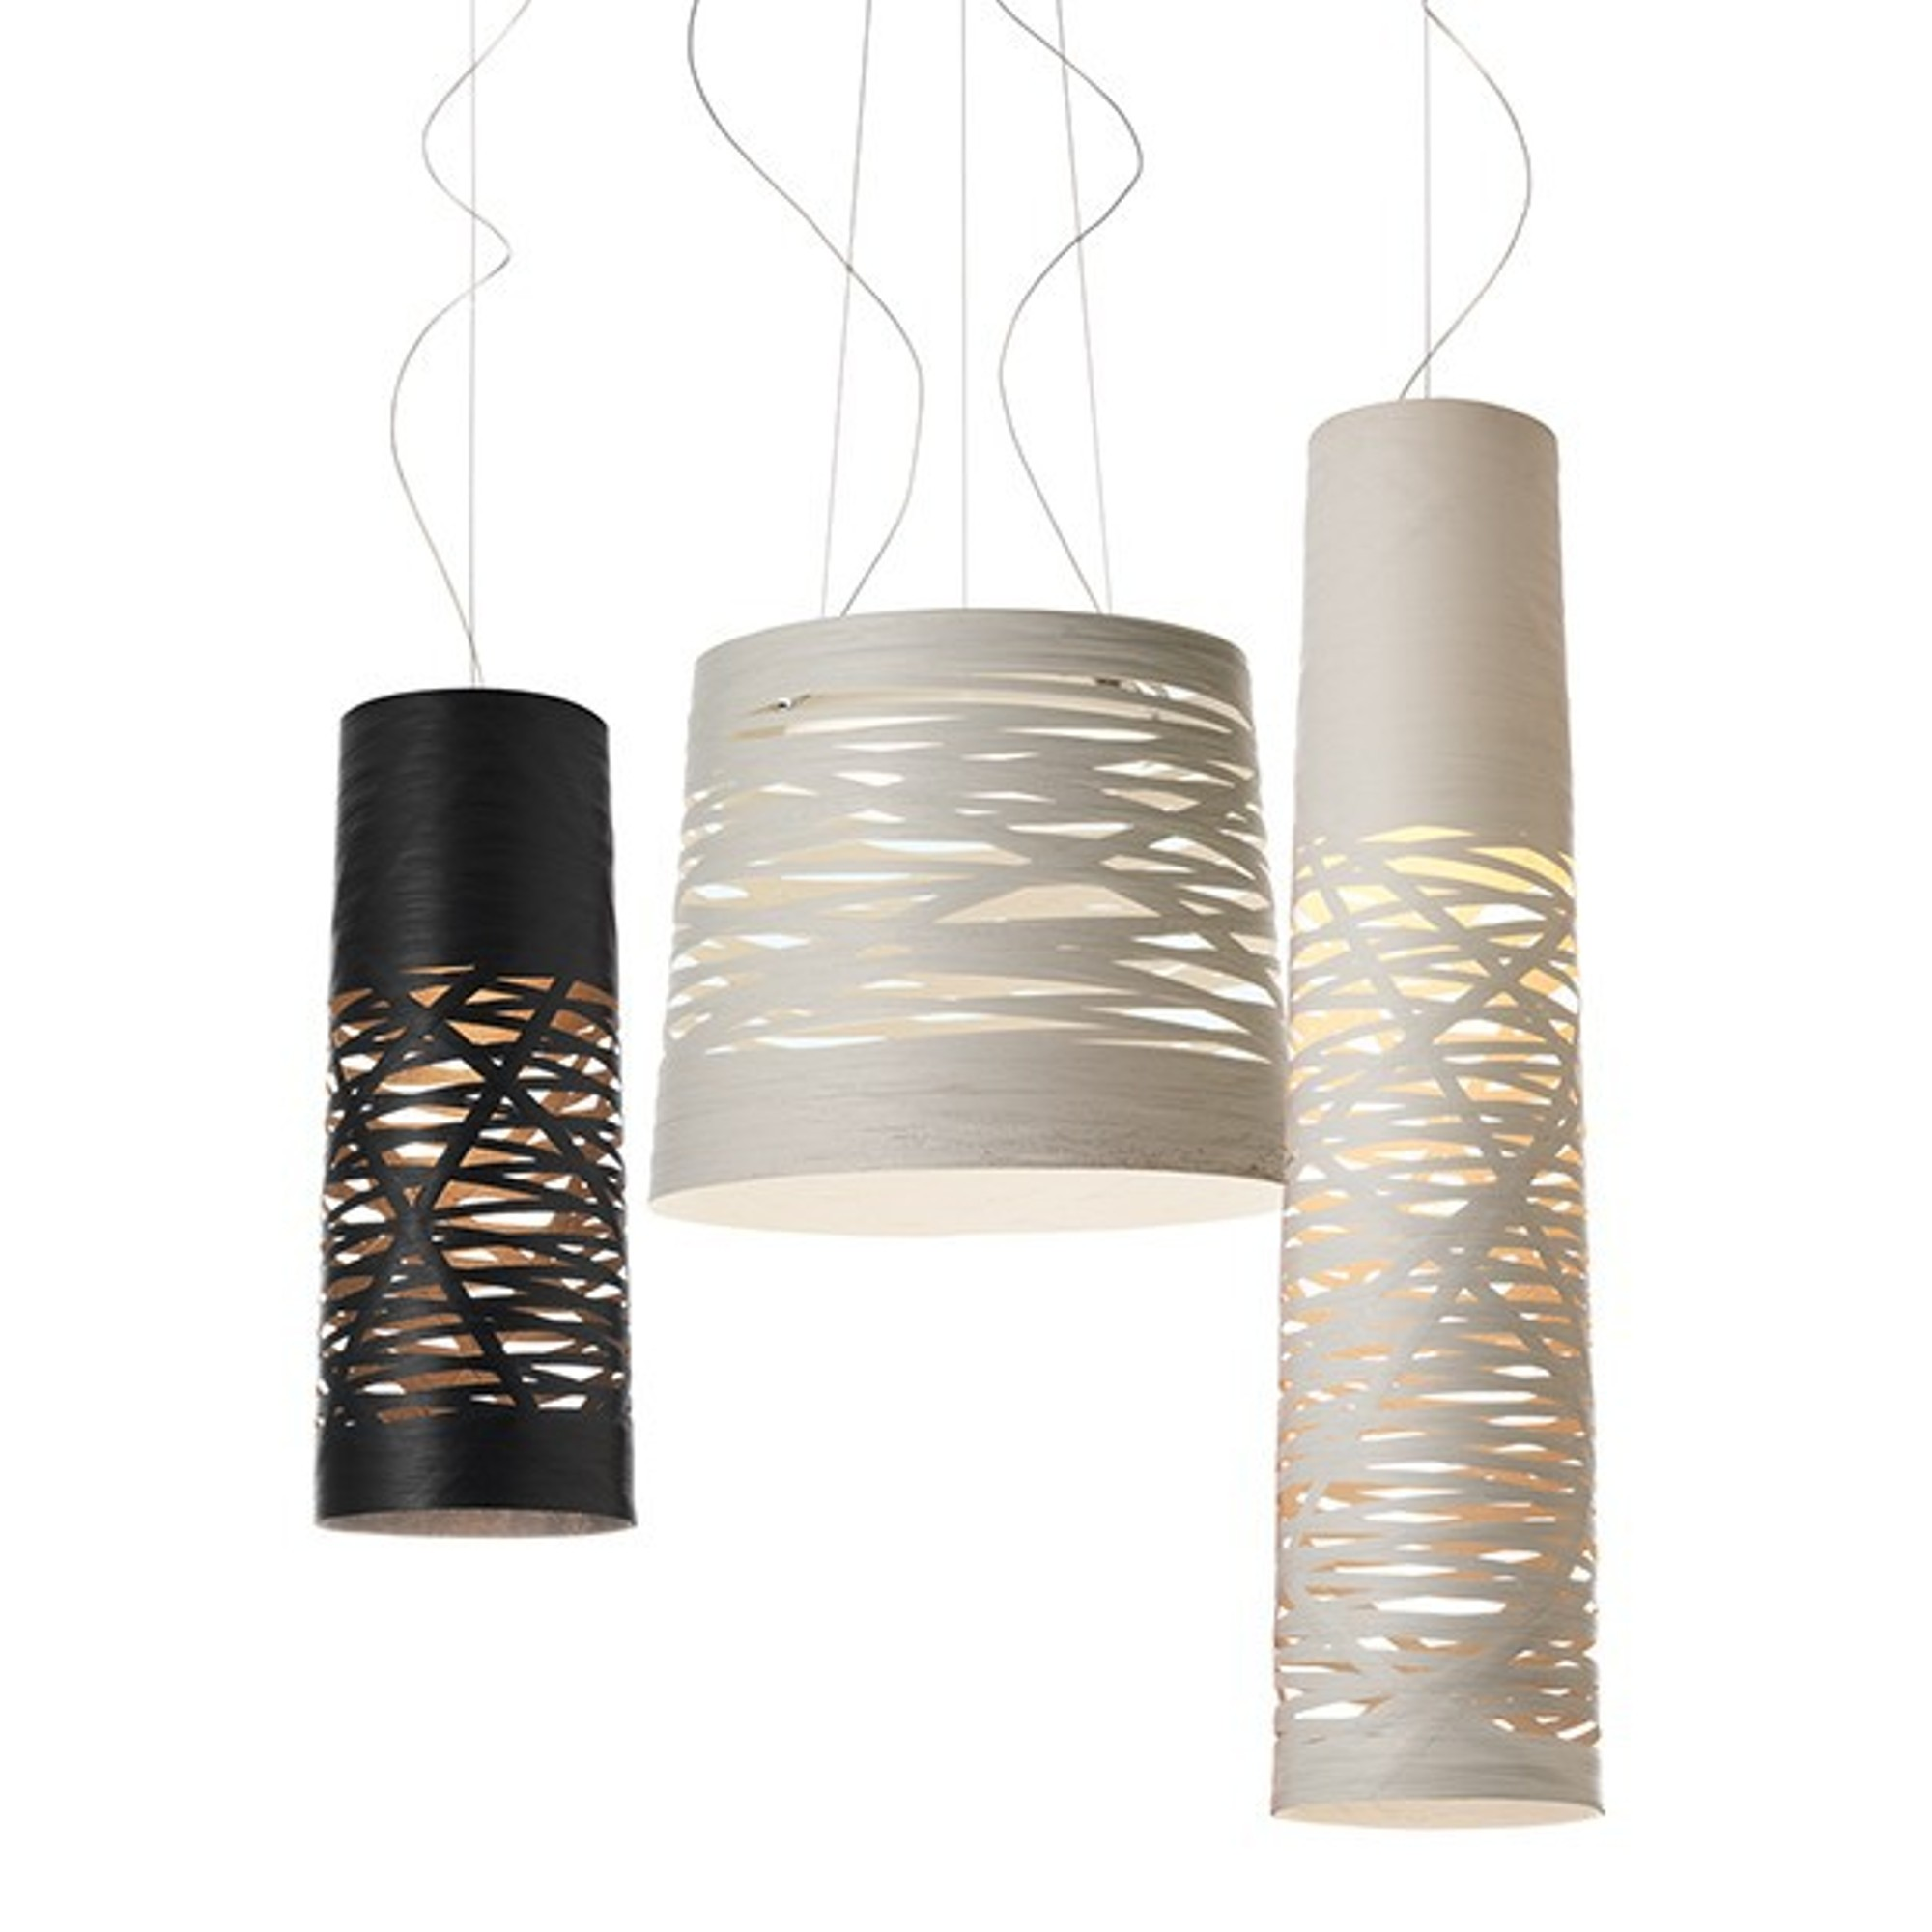 TRESS SUSPENSION LAMP, by FOSCARINI